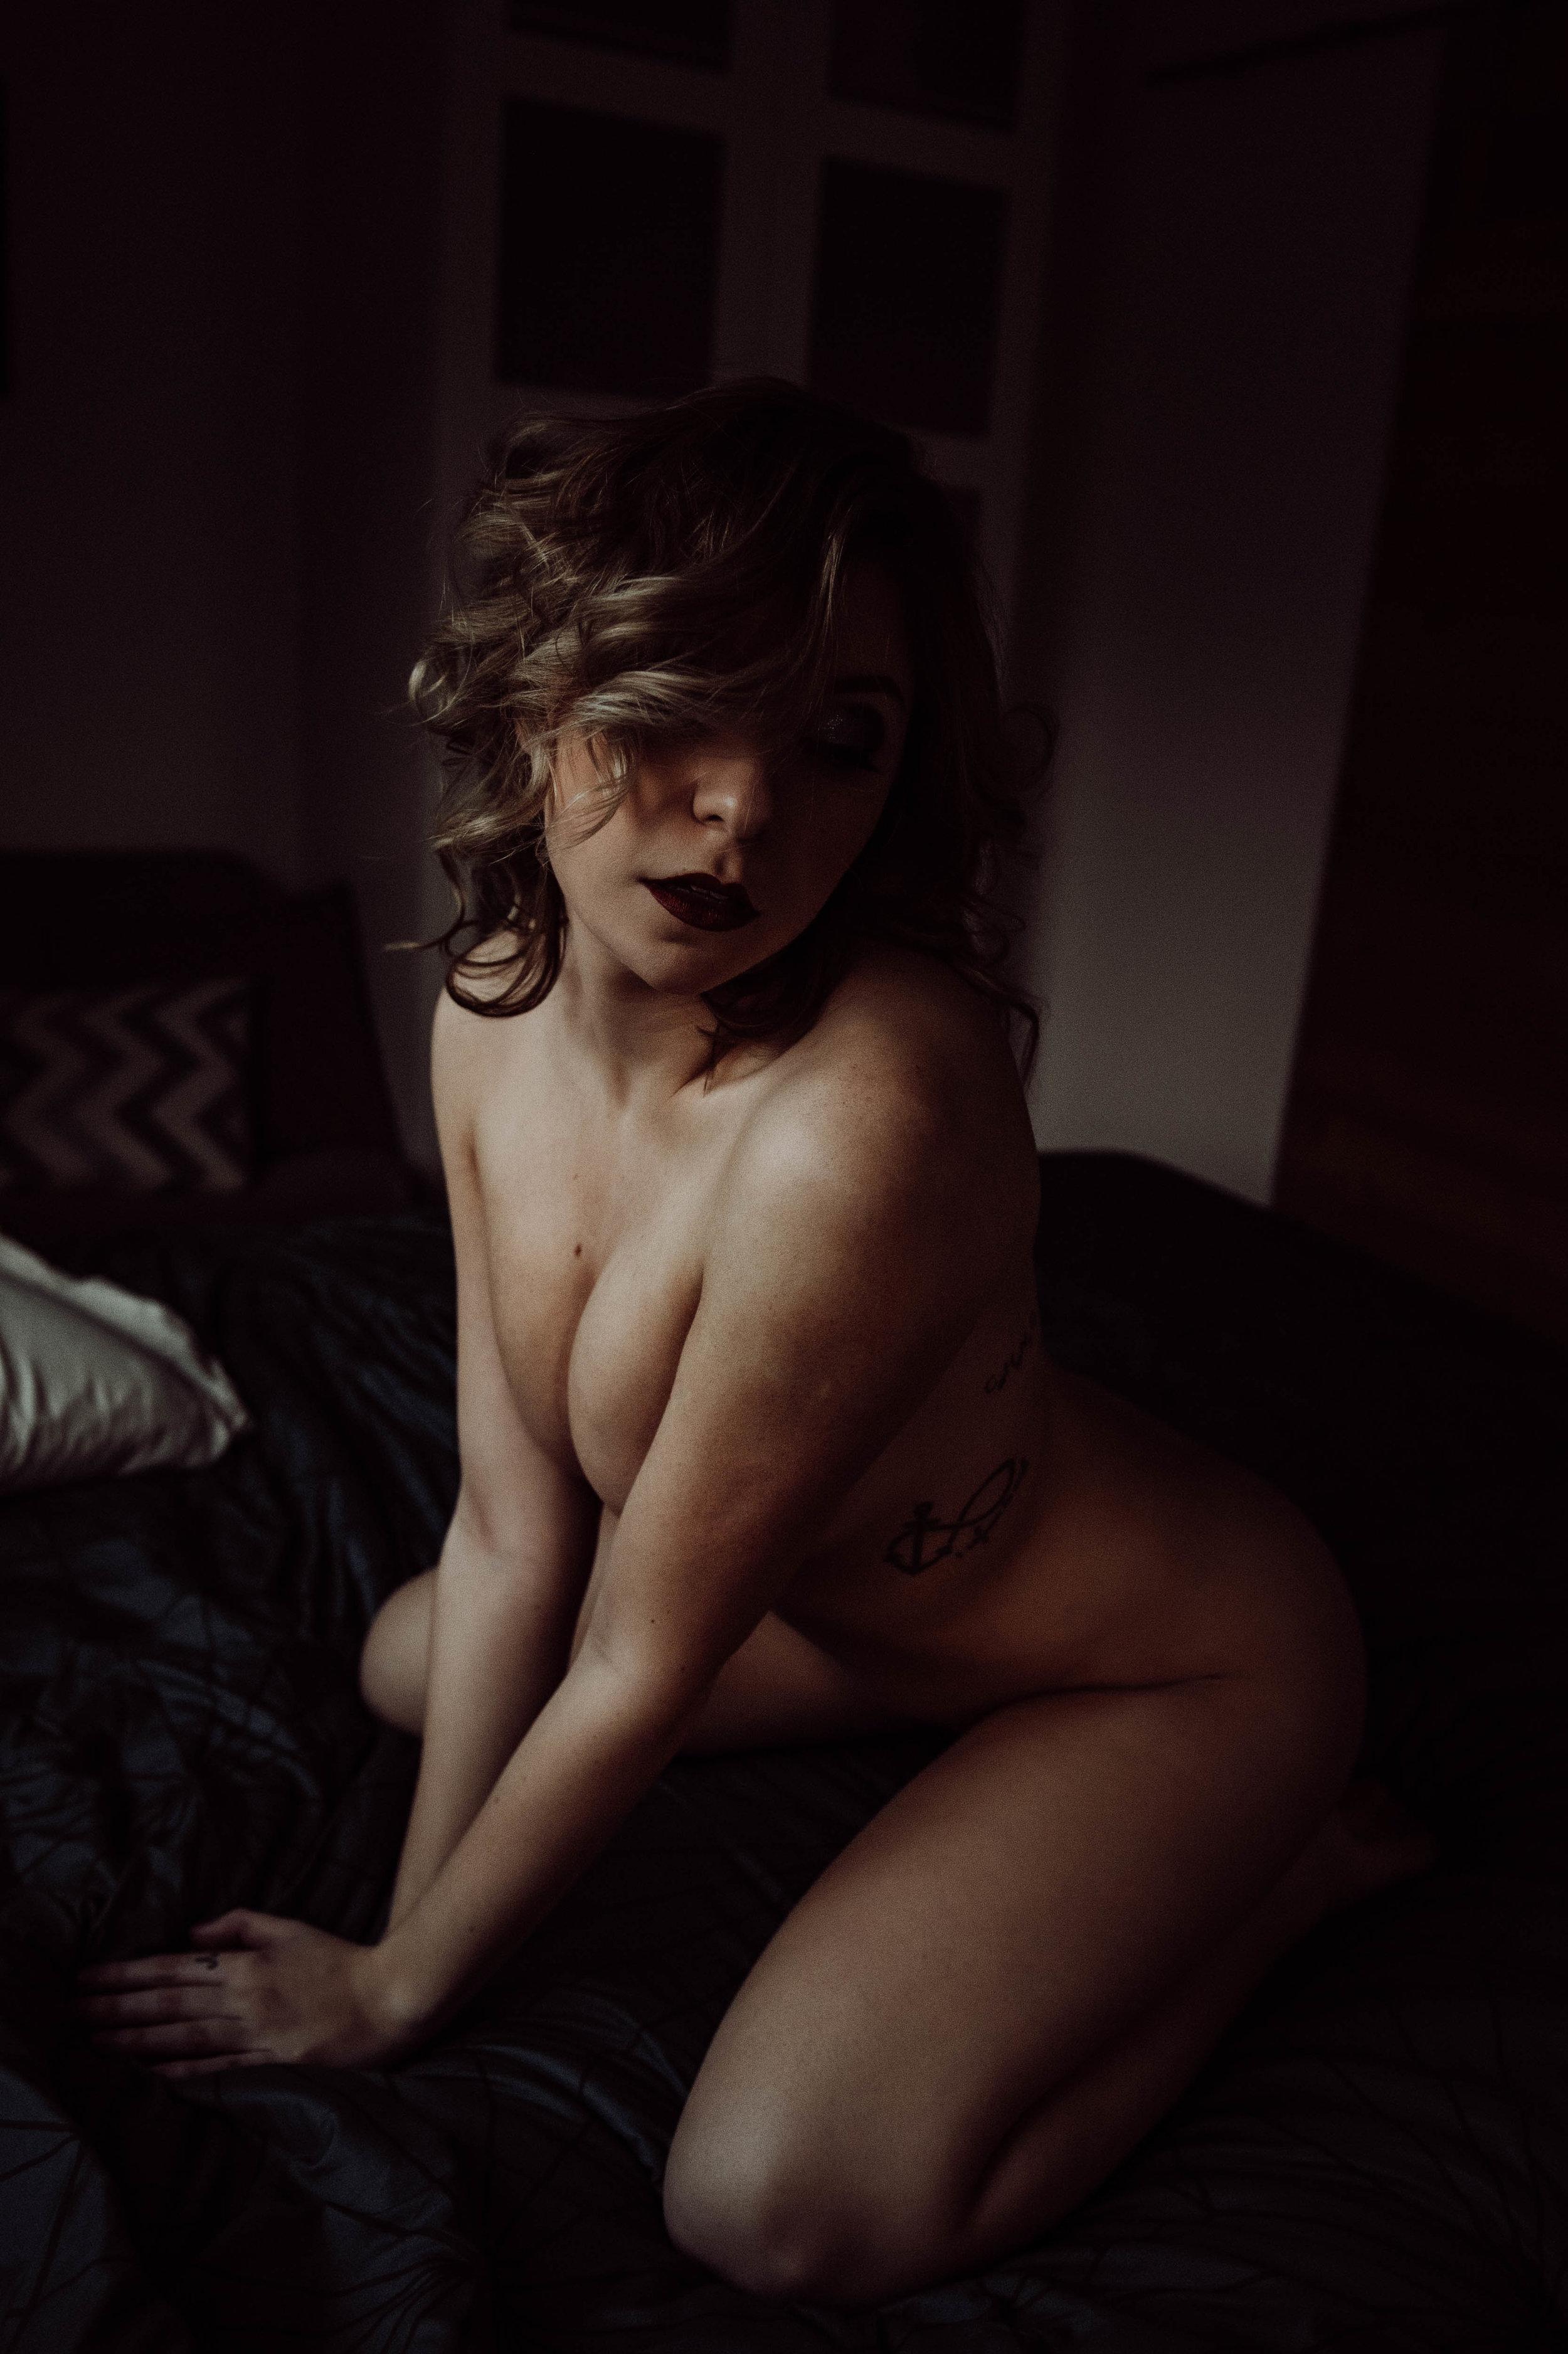 short haired woman kneeling intimate nude photography boudoir photography new york city studio